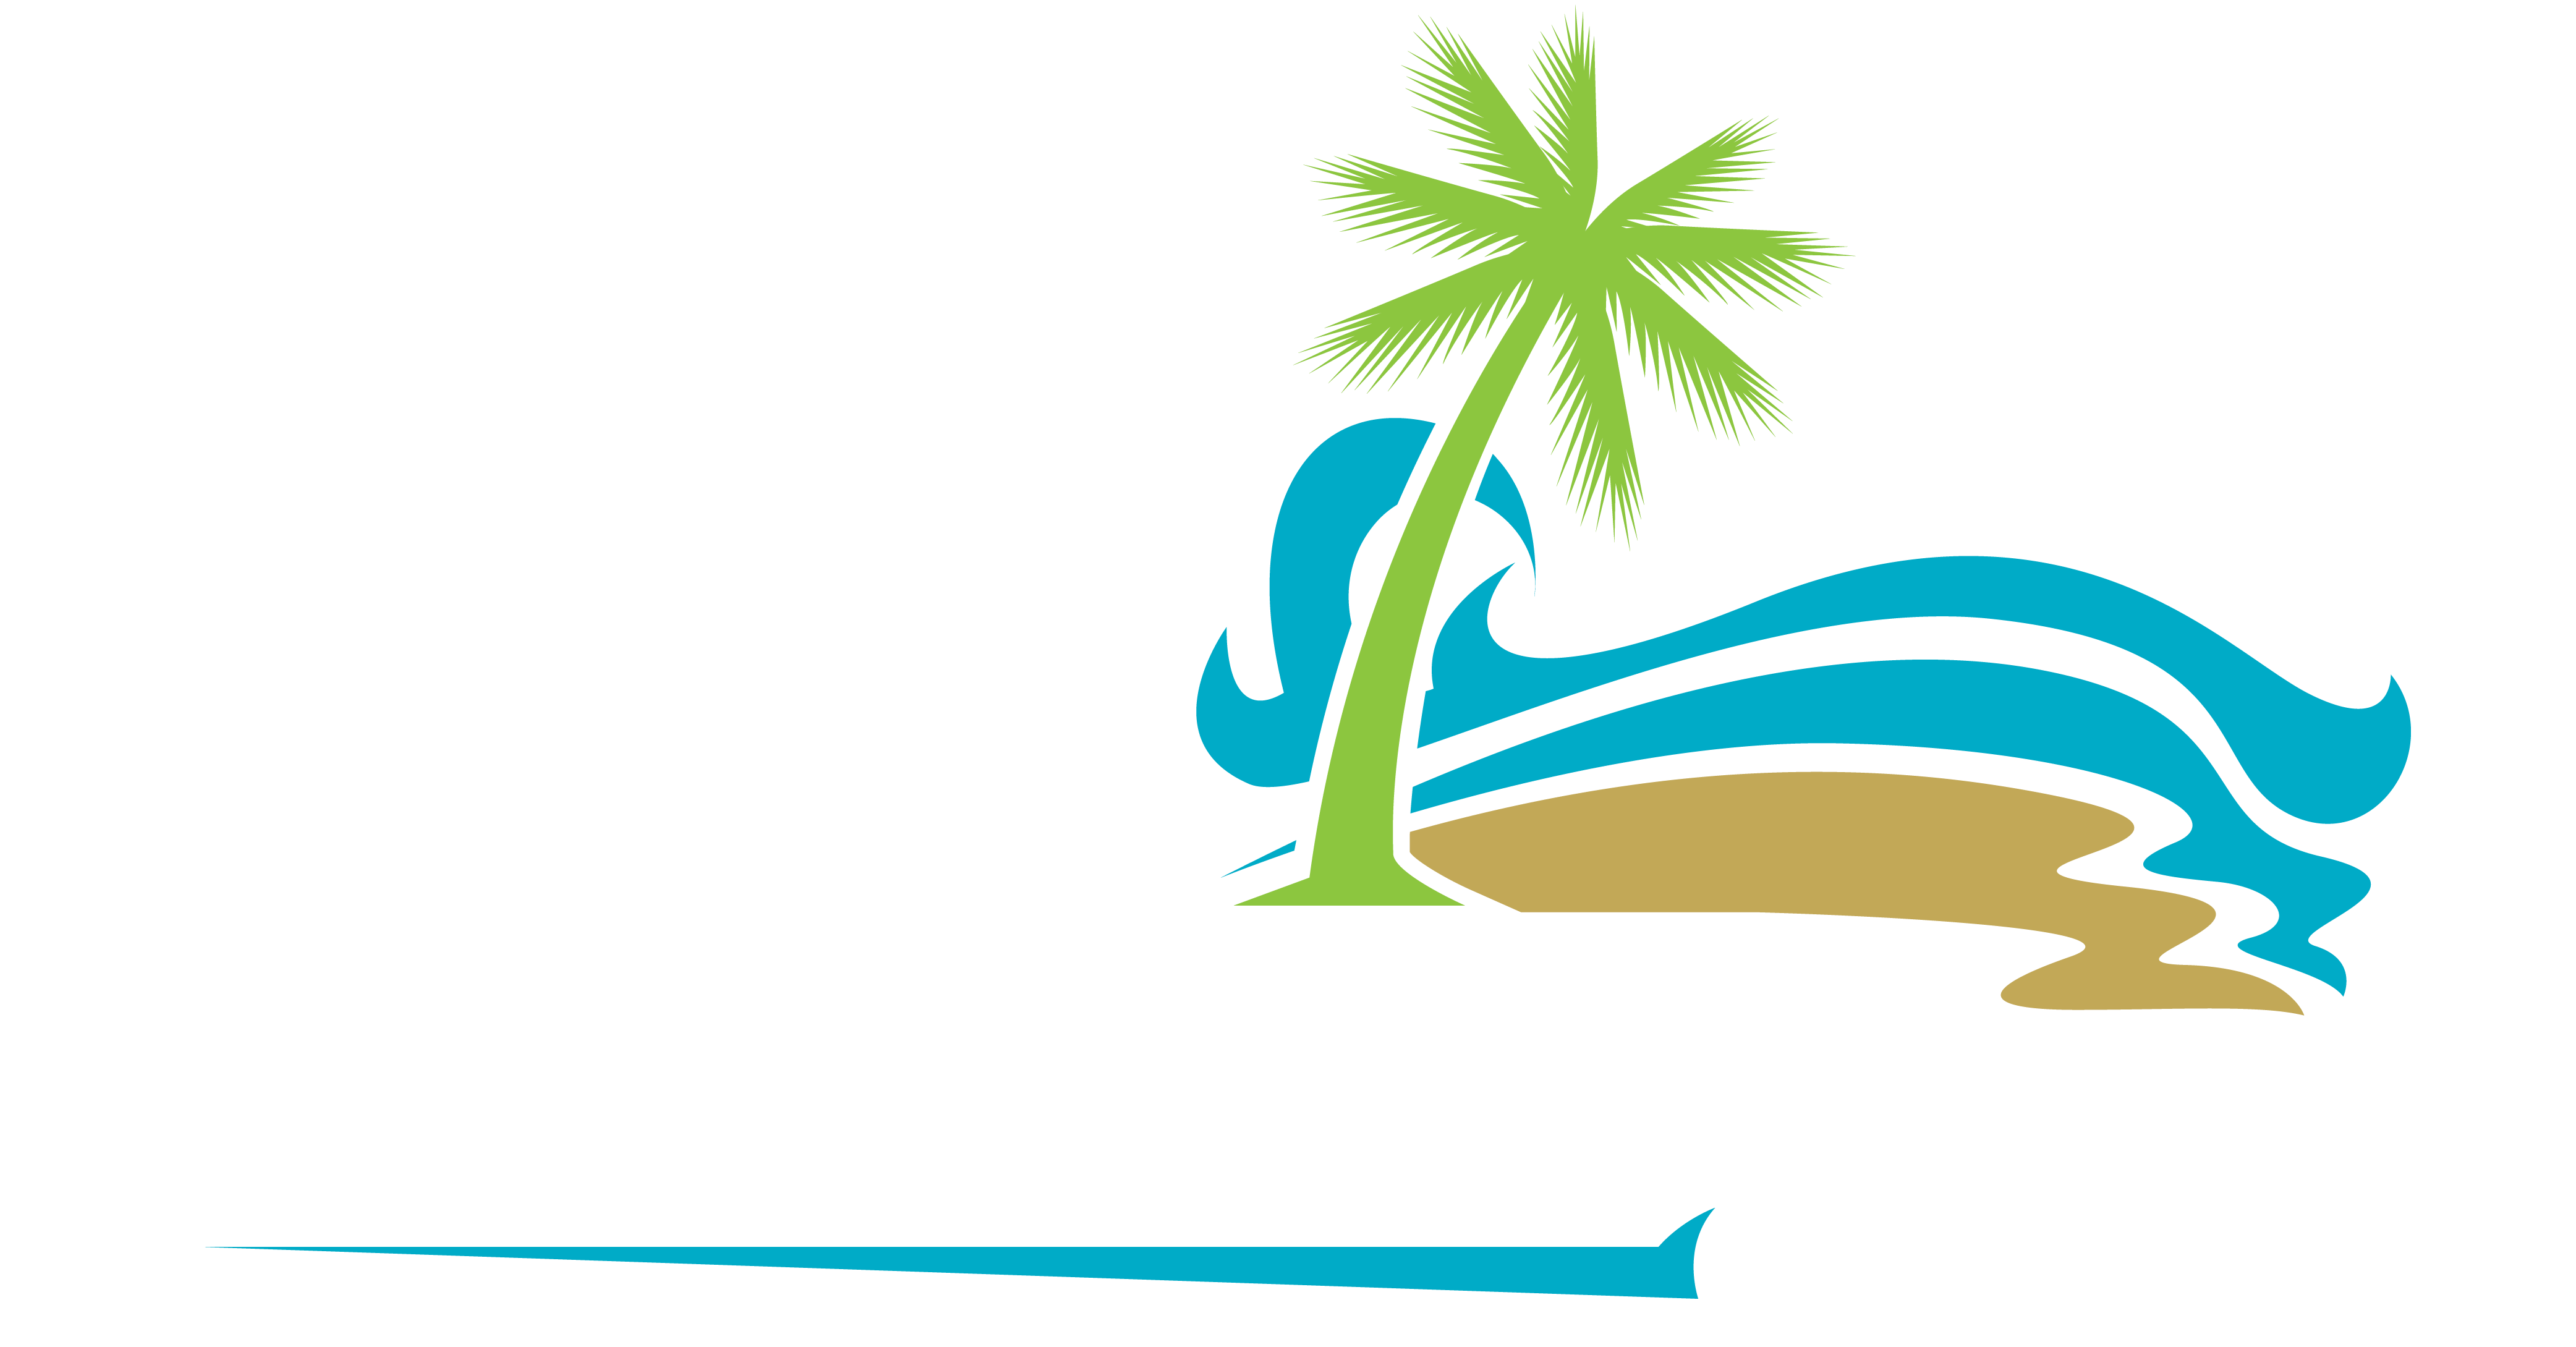 Teachers Hideaway Bookstore